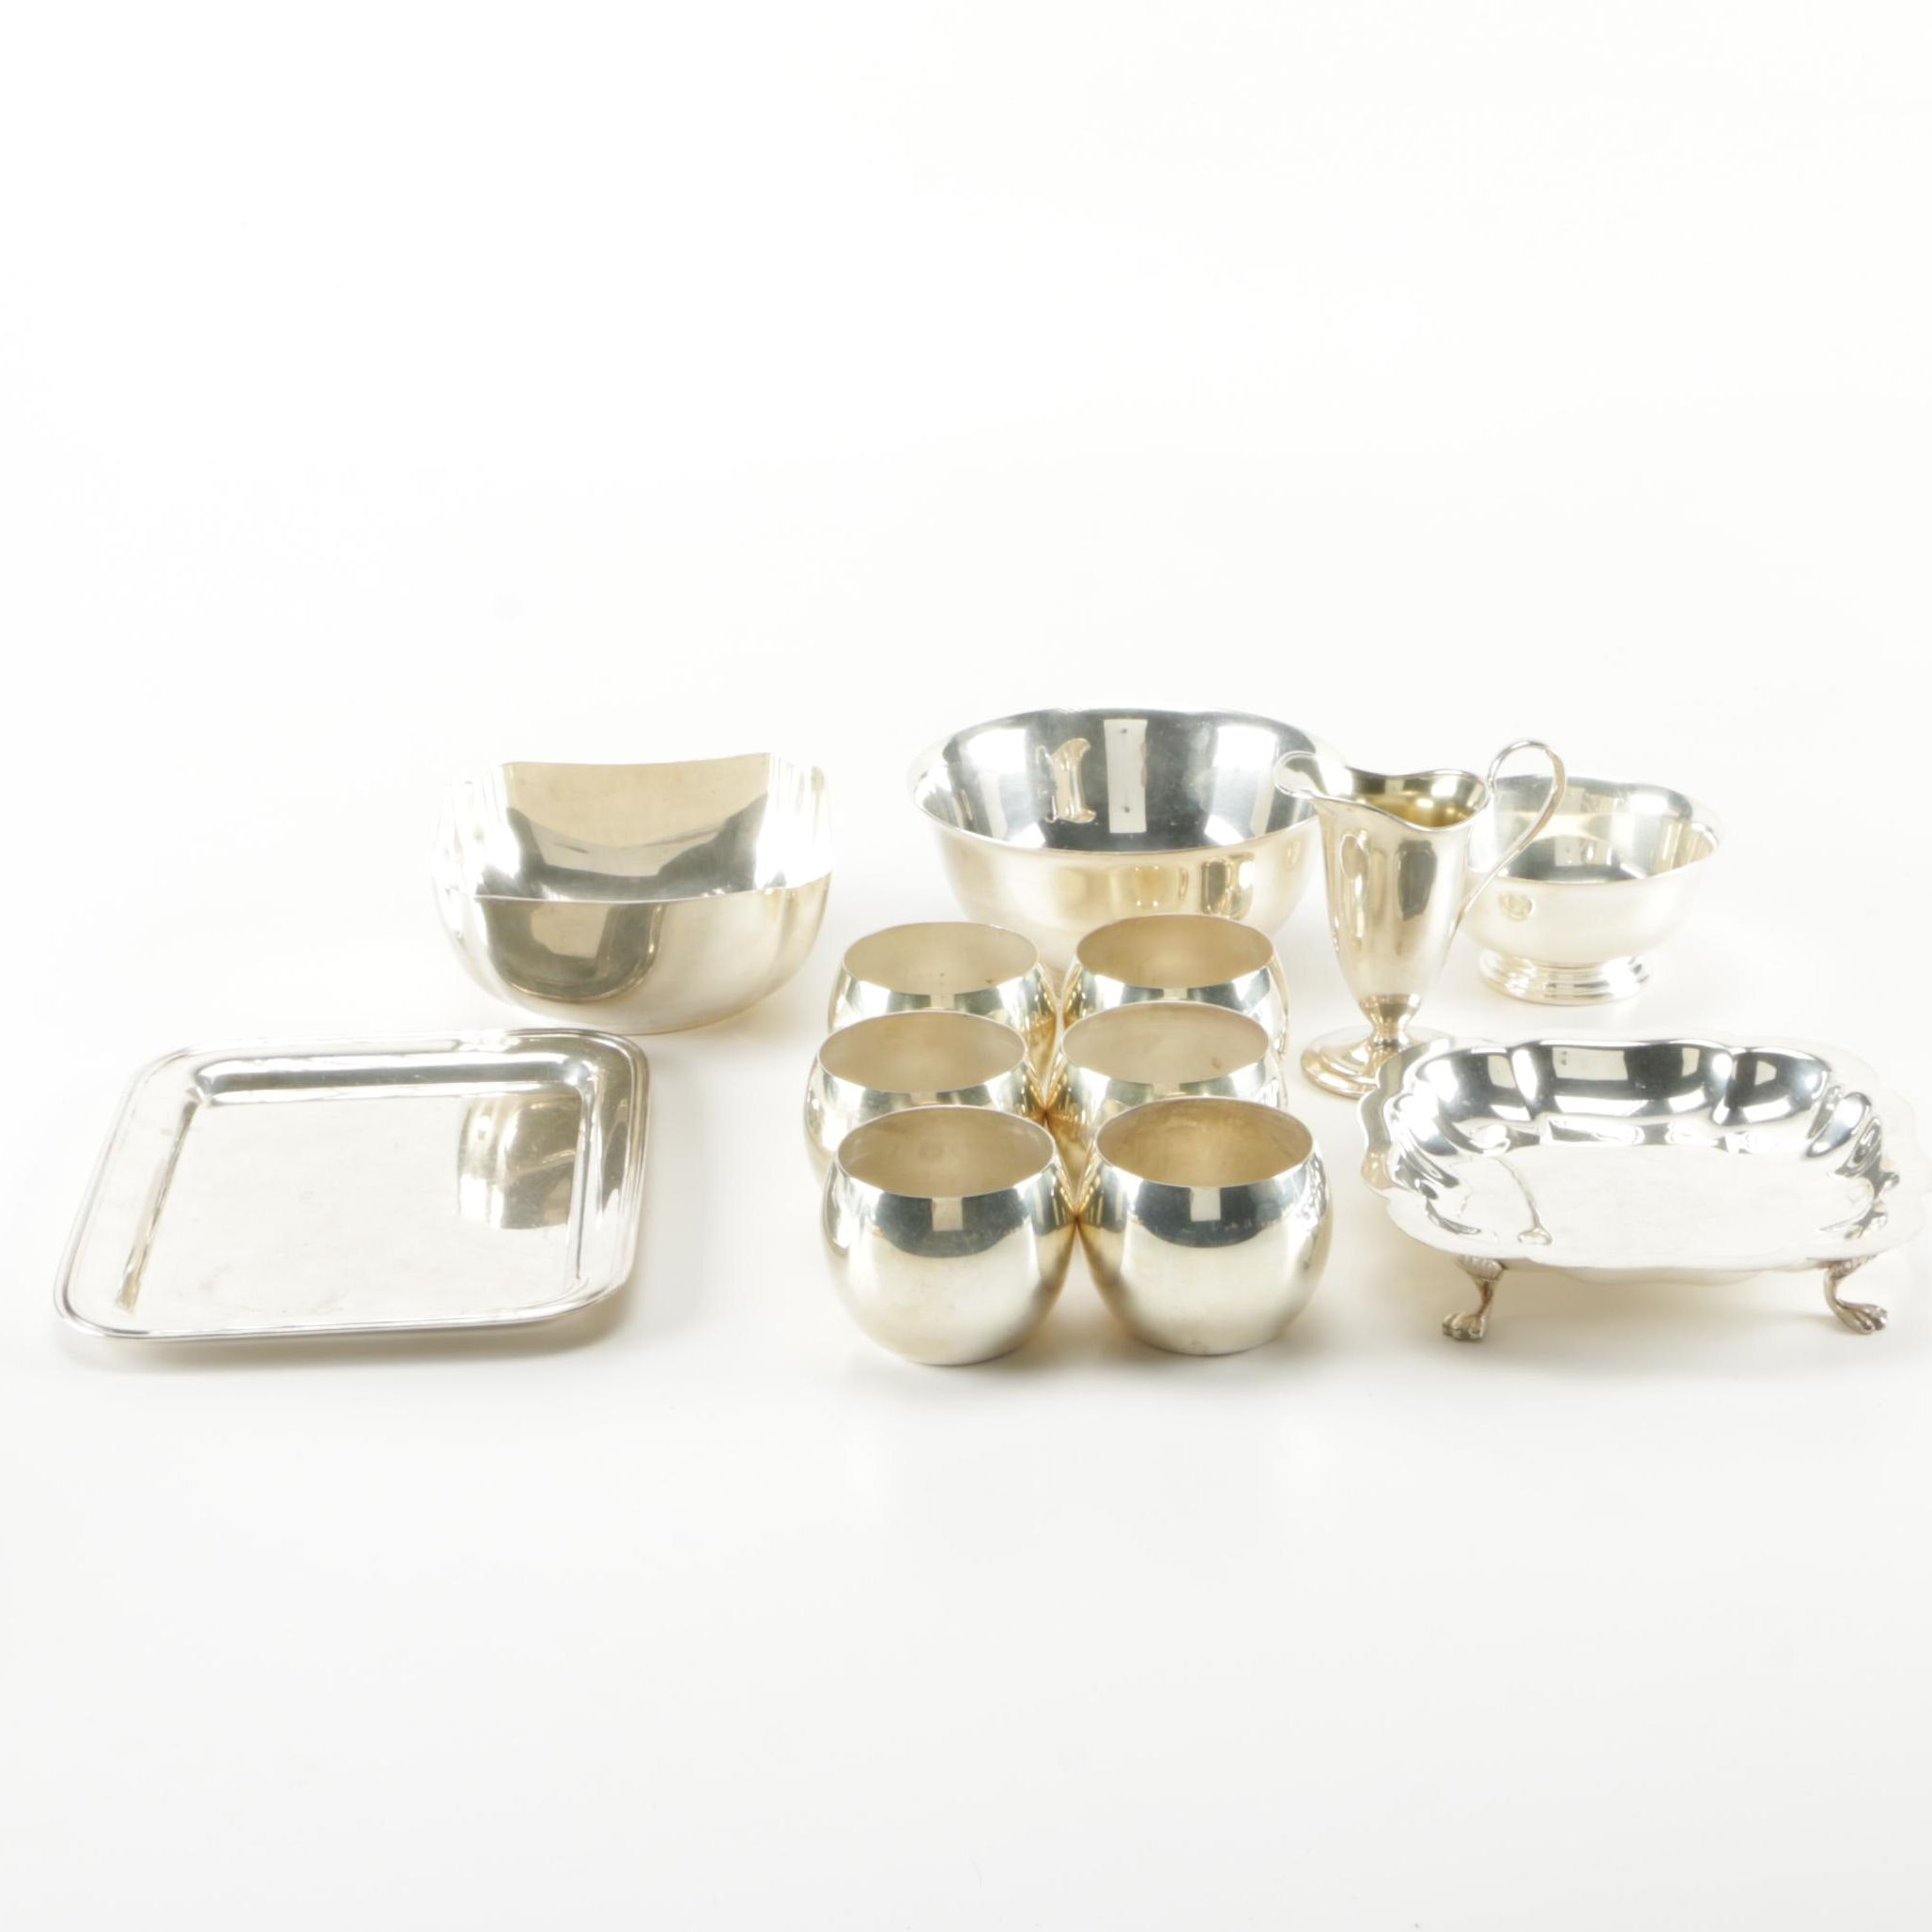 Generous Assortment of Silver Plate Tableware